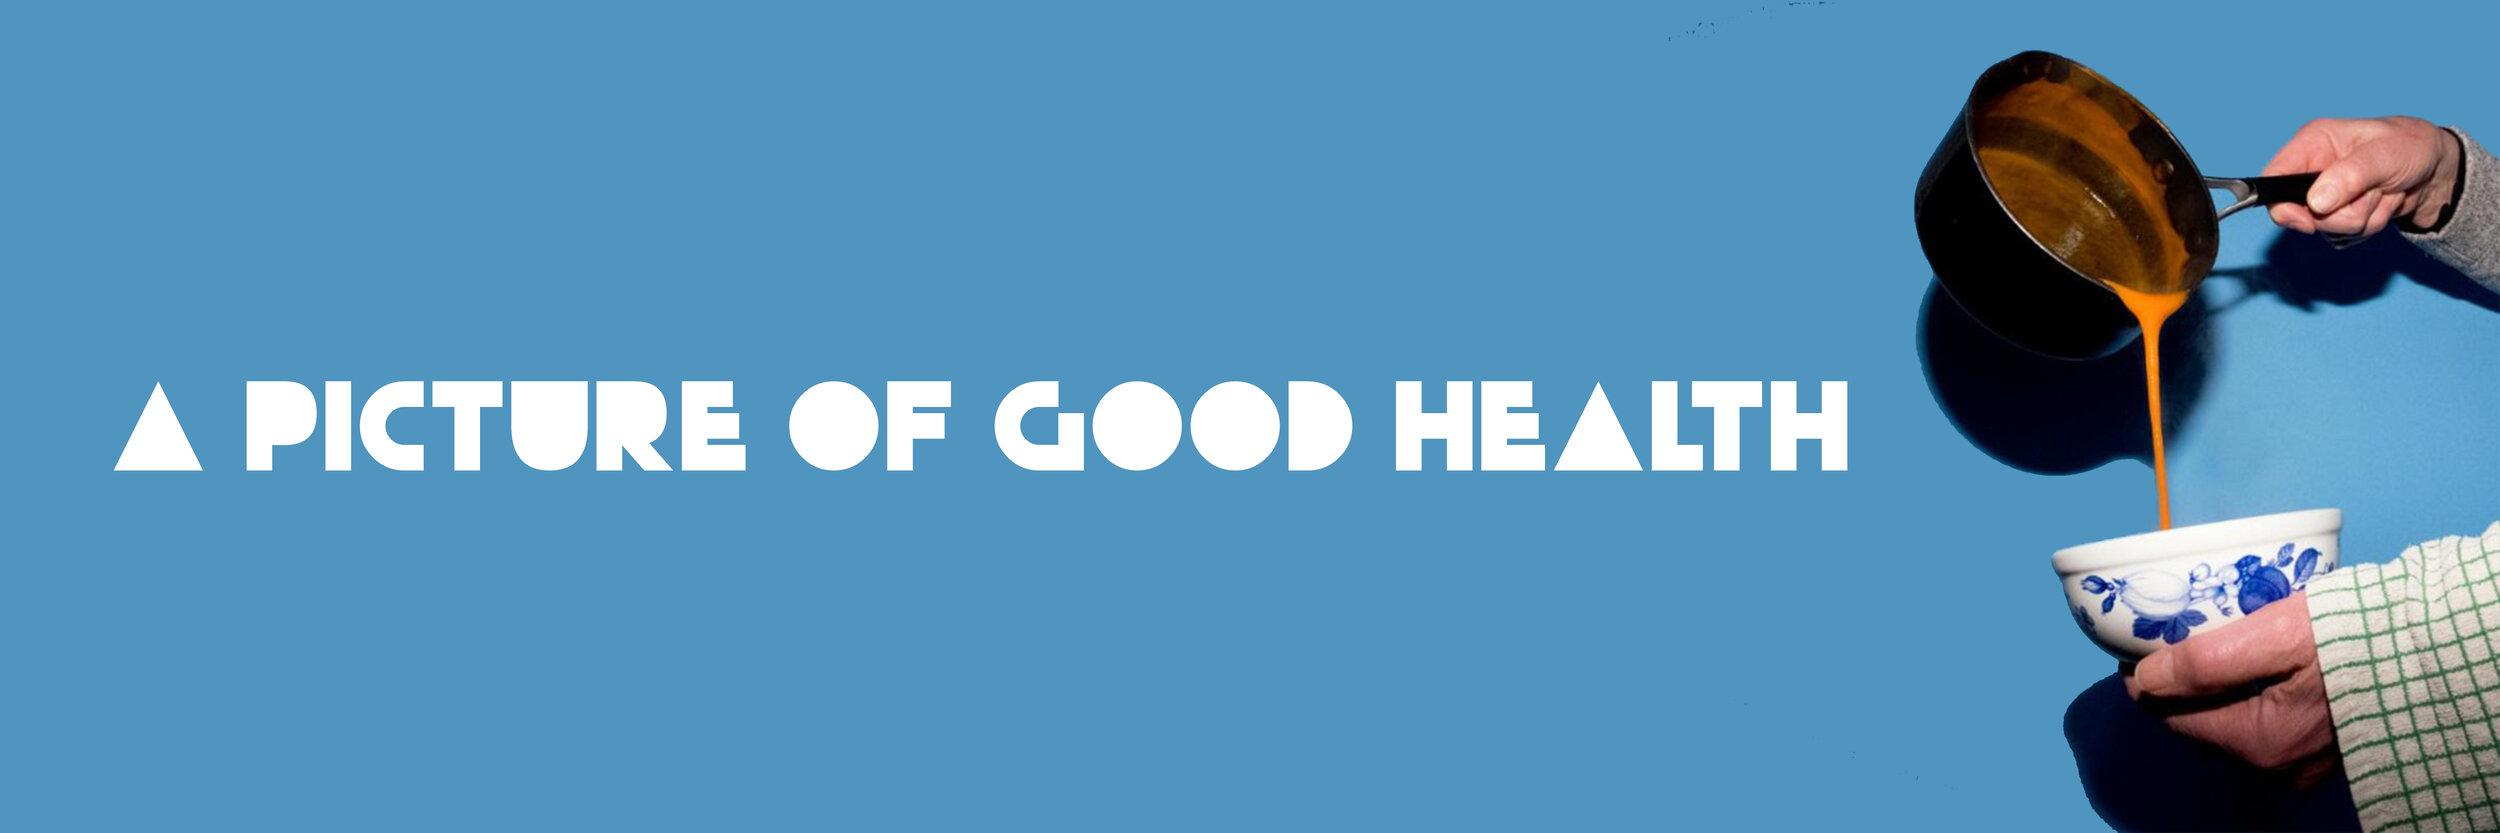 Life Good Health.jpg